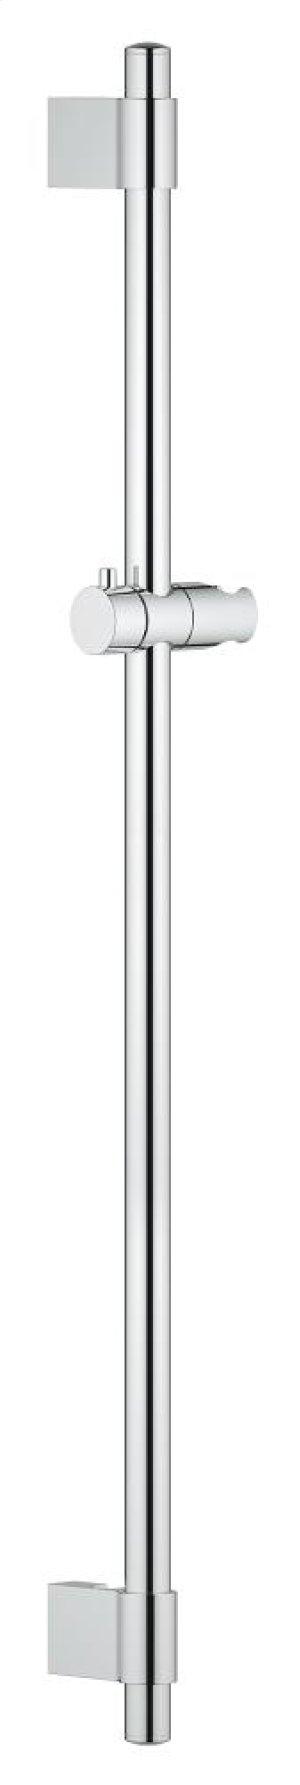 Power&Soul 36 Shower Bar Product Image